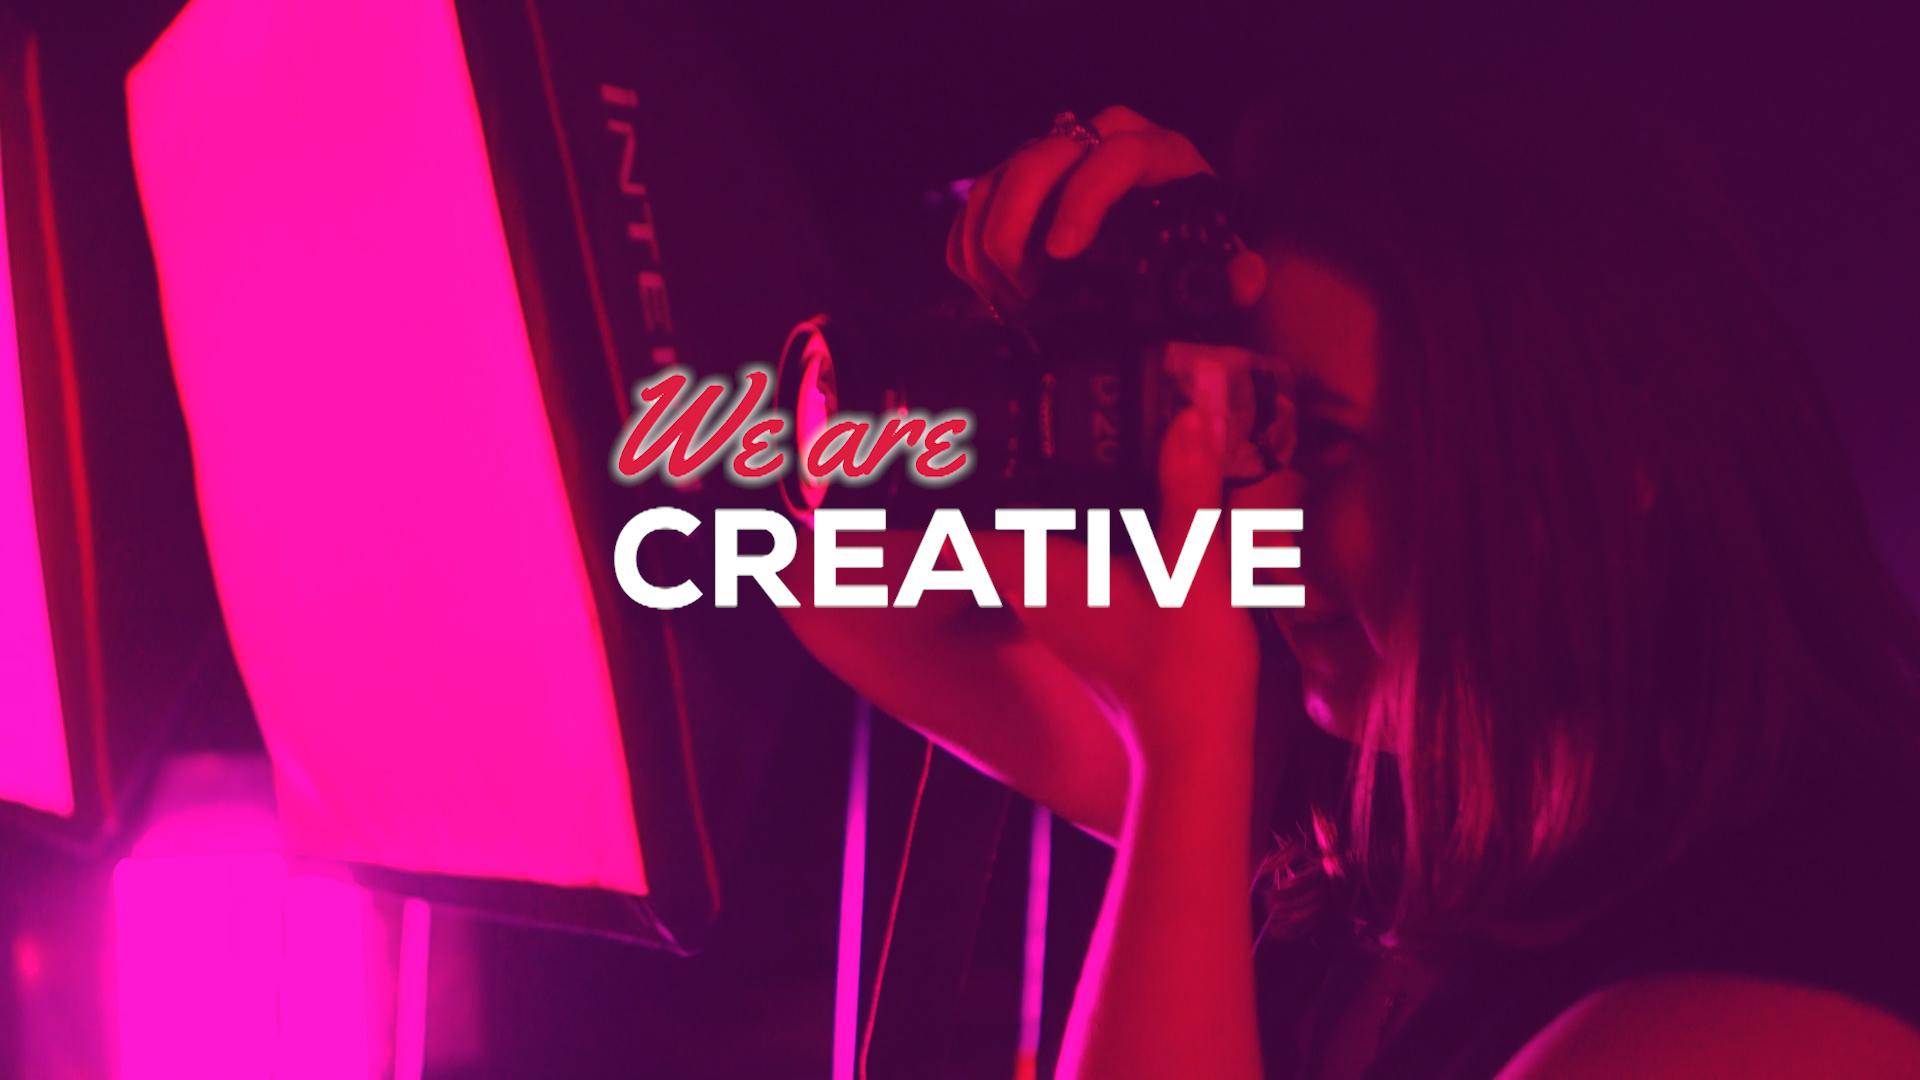 Why study Creative Arts?